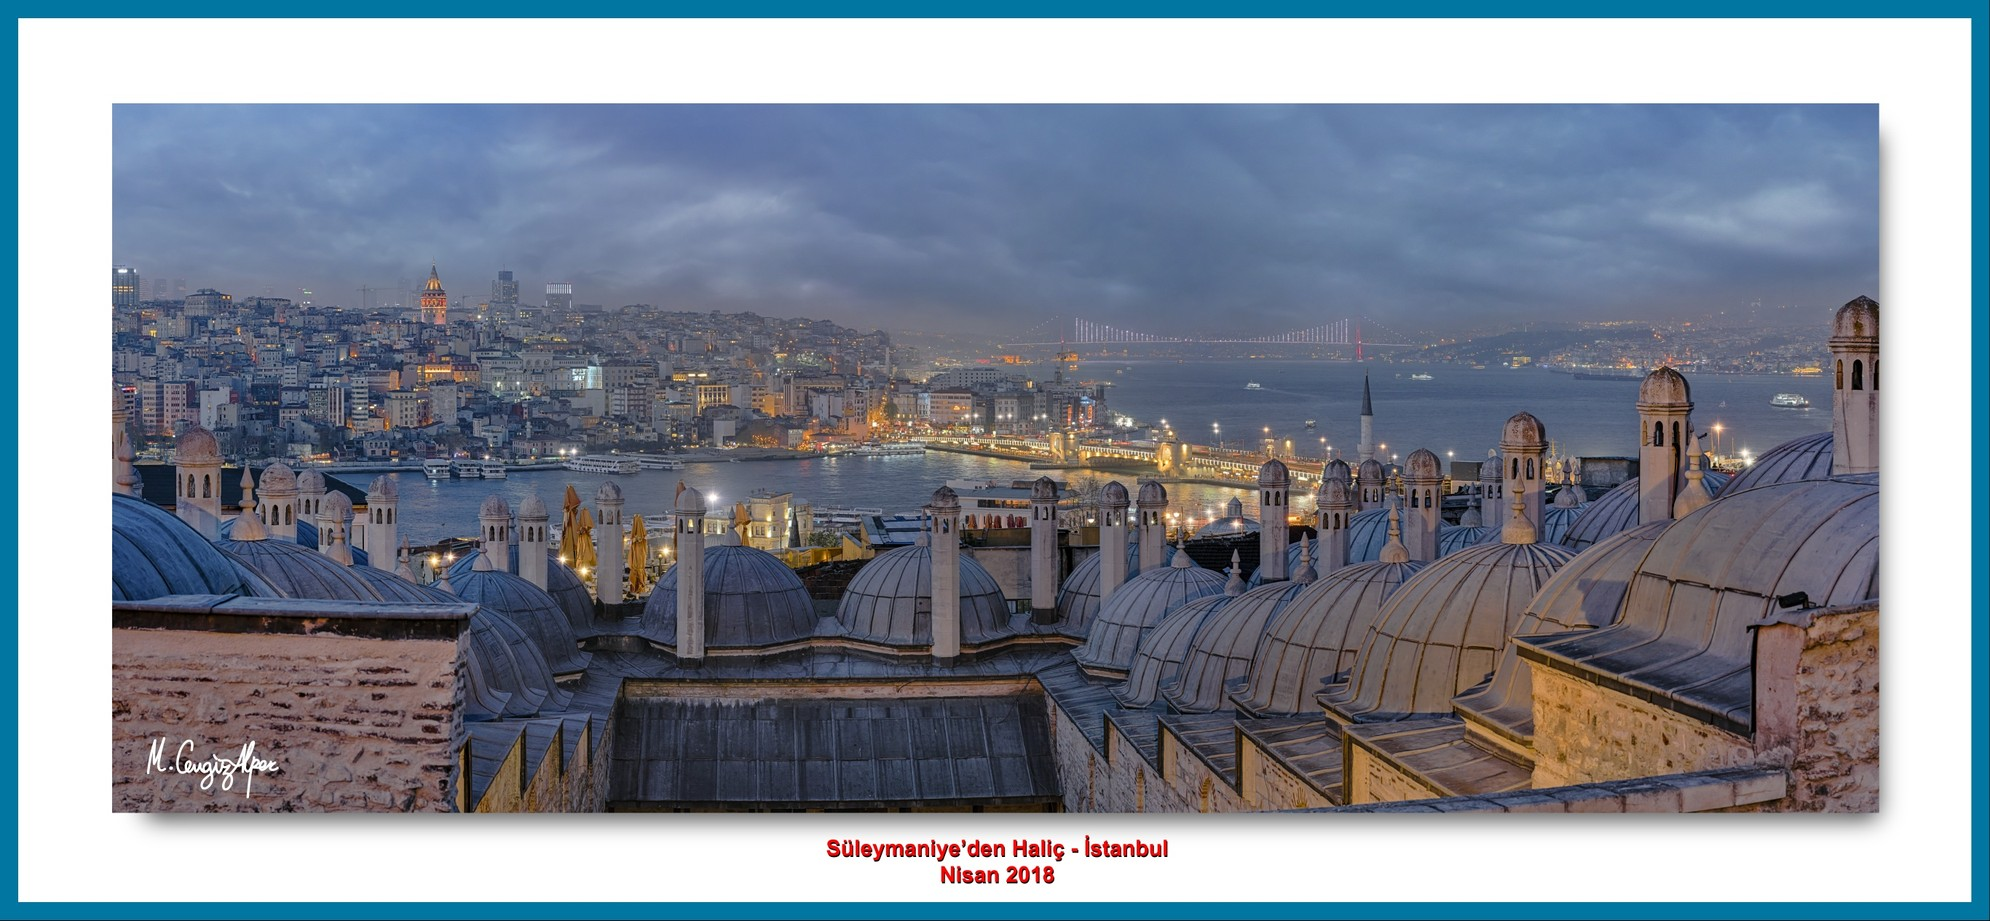 Golden Horn From Süleymaniye (2) - İstanbul - TURKEY